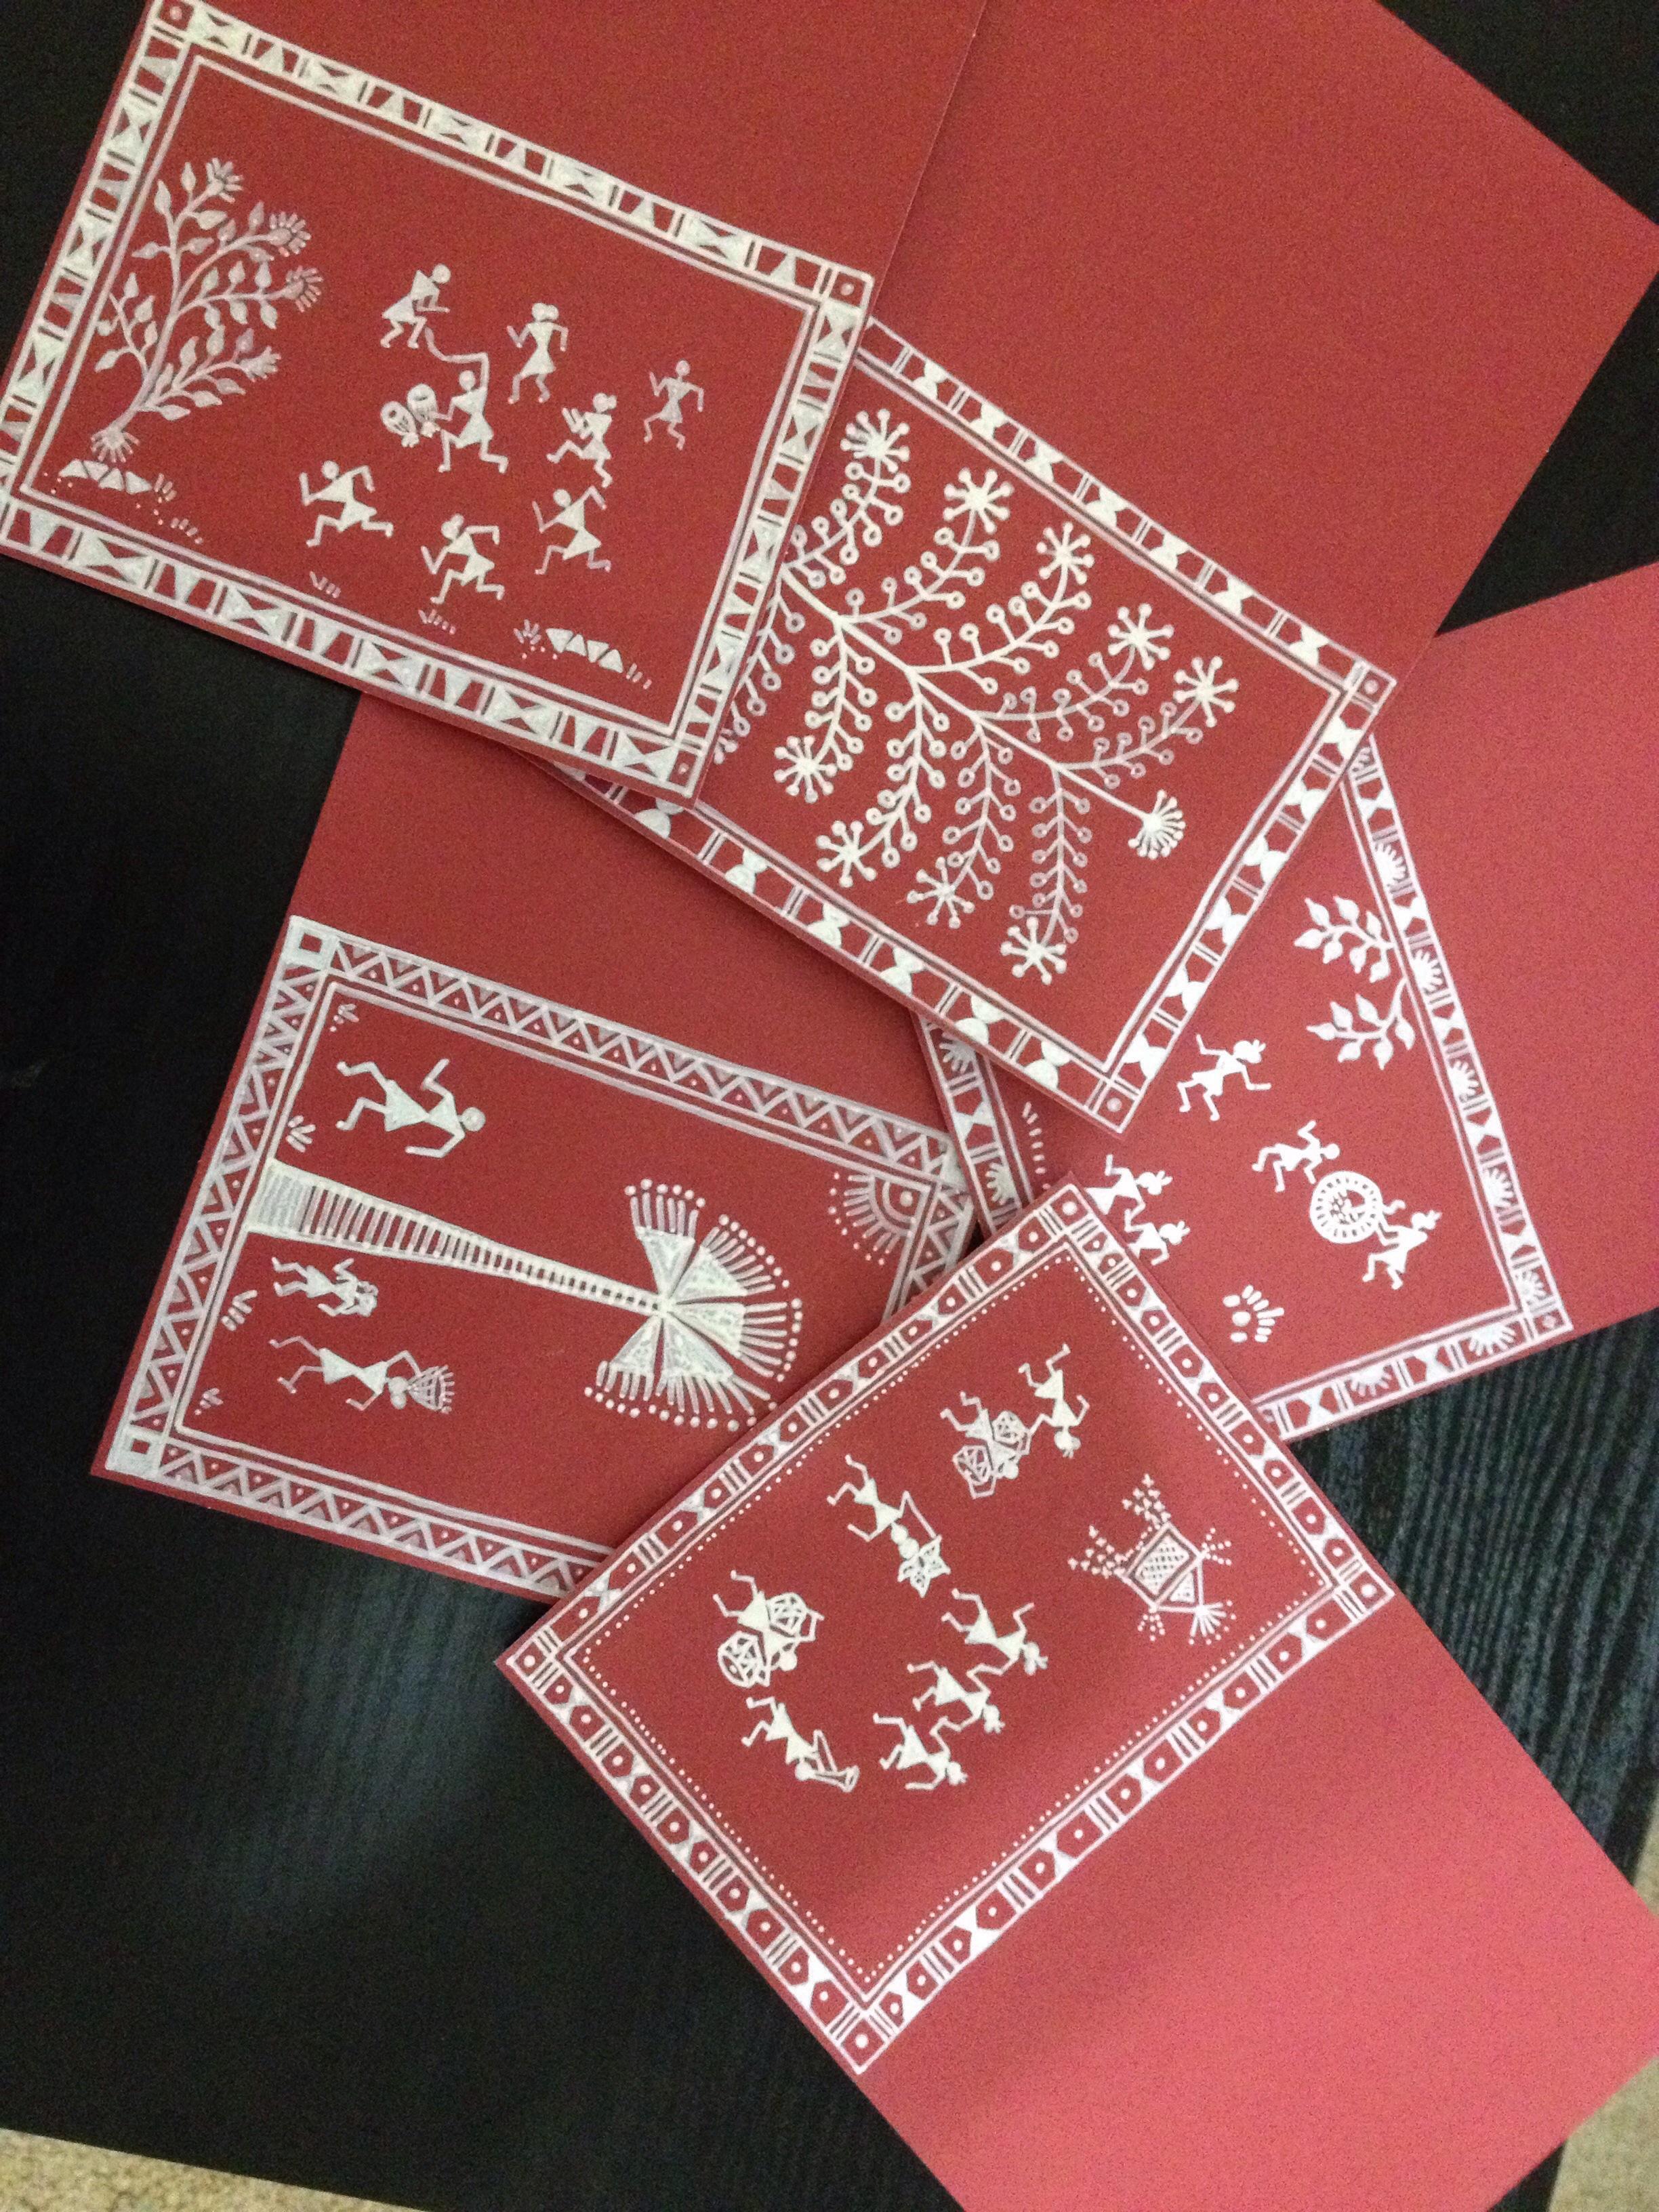 Seasons greeting card dessein alls blog tag seasons greeting card kristyandbryce Gallery